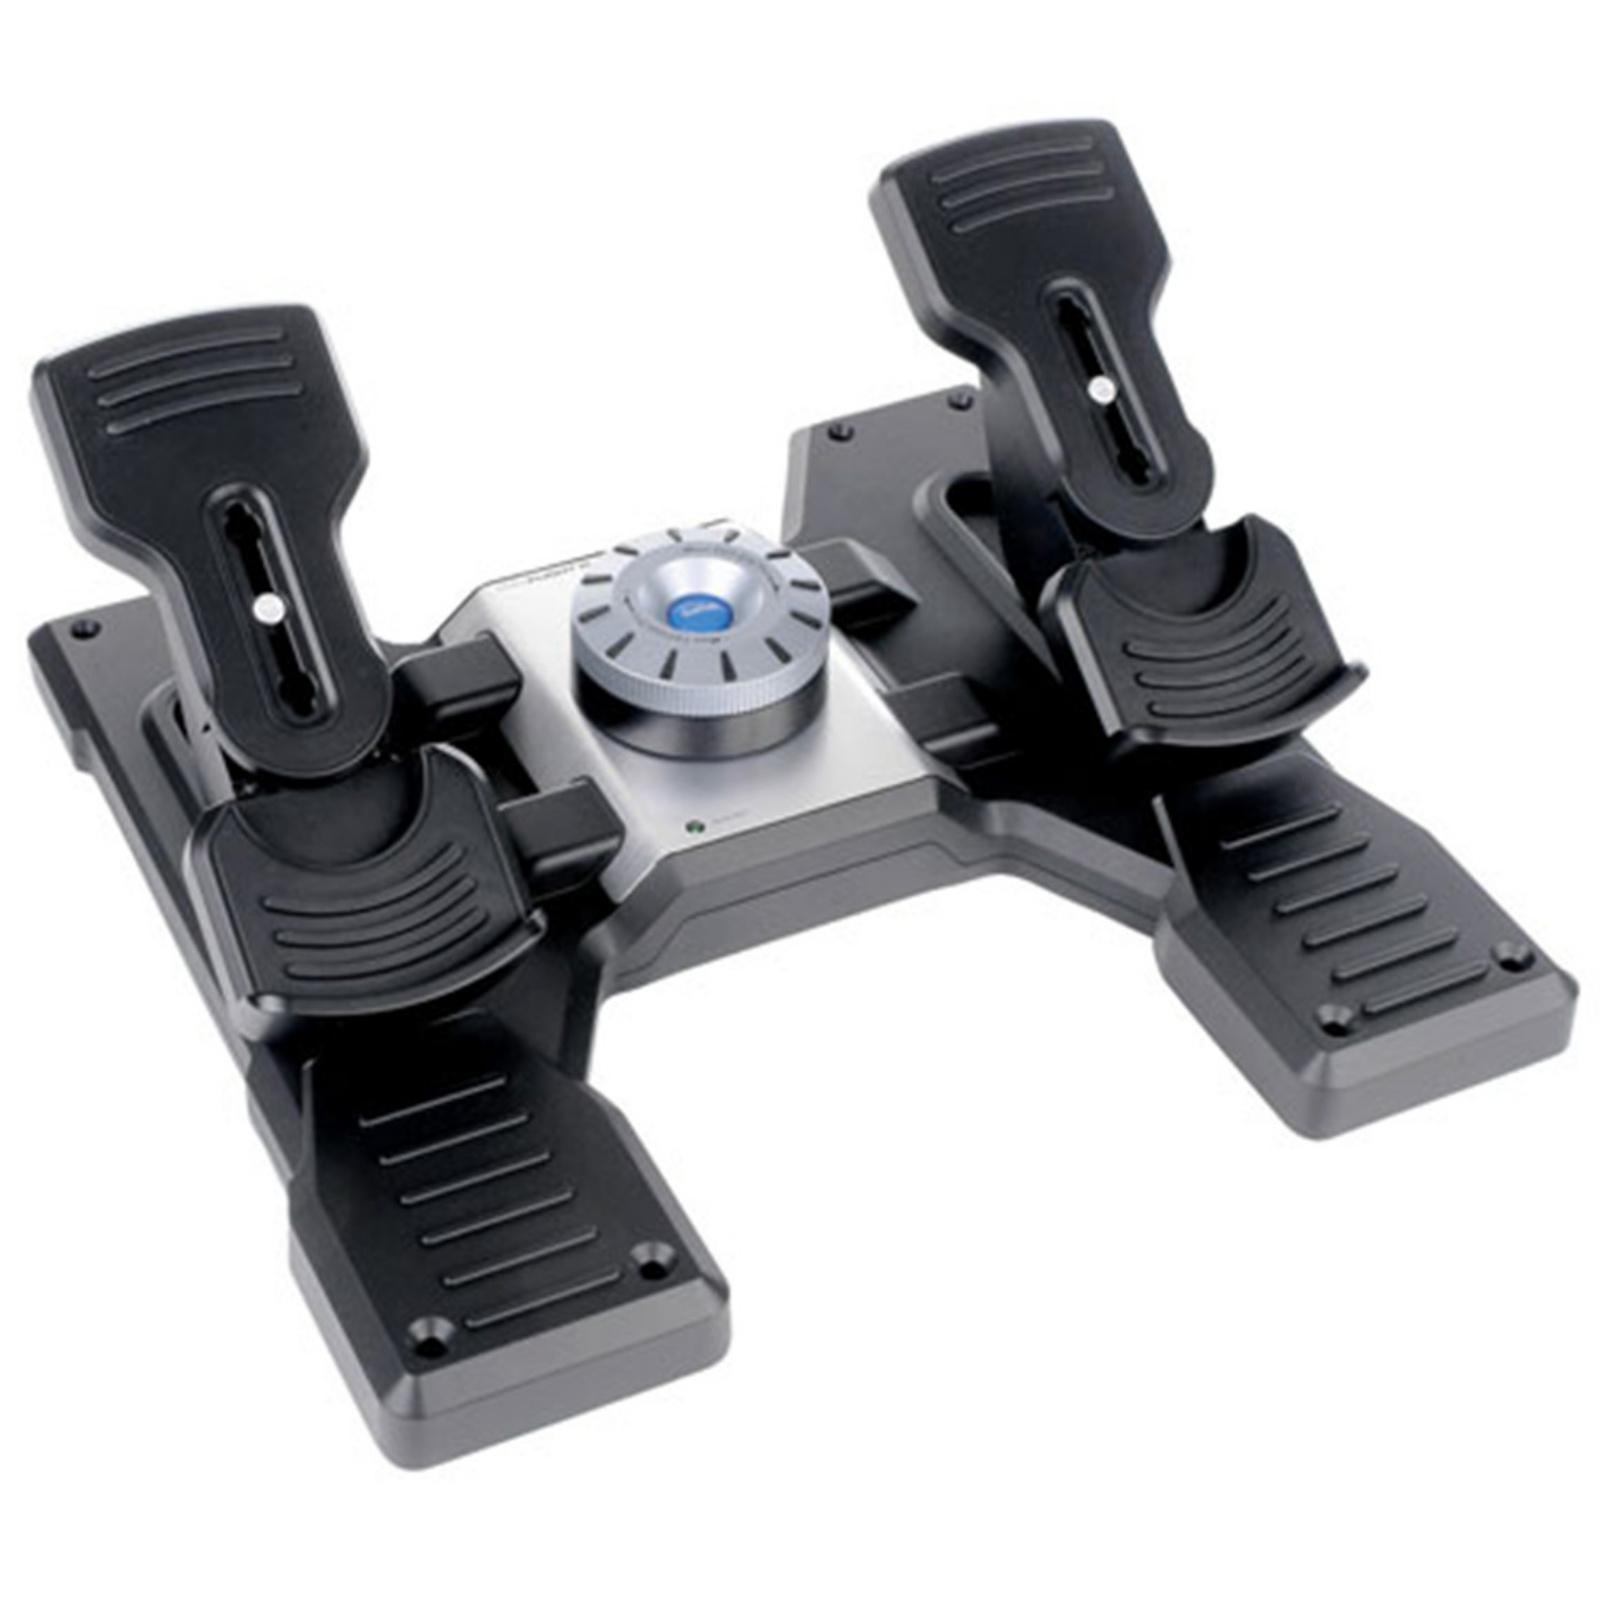 15725a748ec Buy the Logitech Pro Flight Gaming Rudder Pedals ( 945-000024 ...